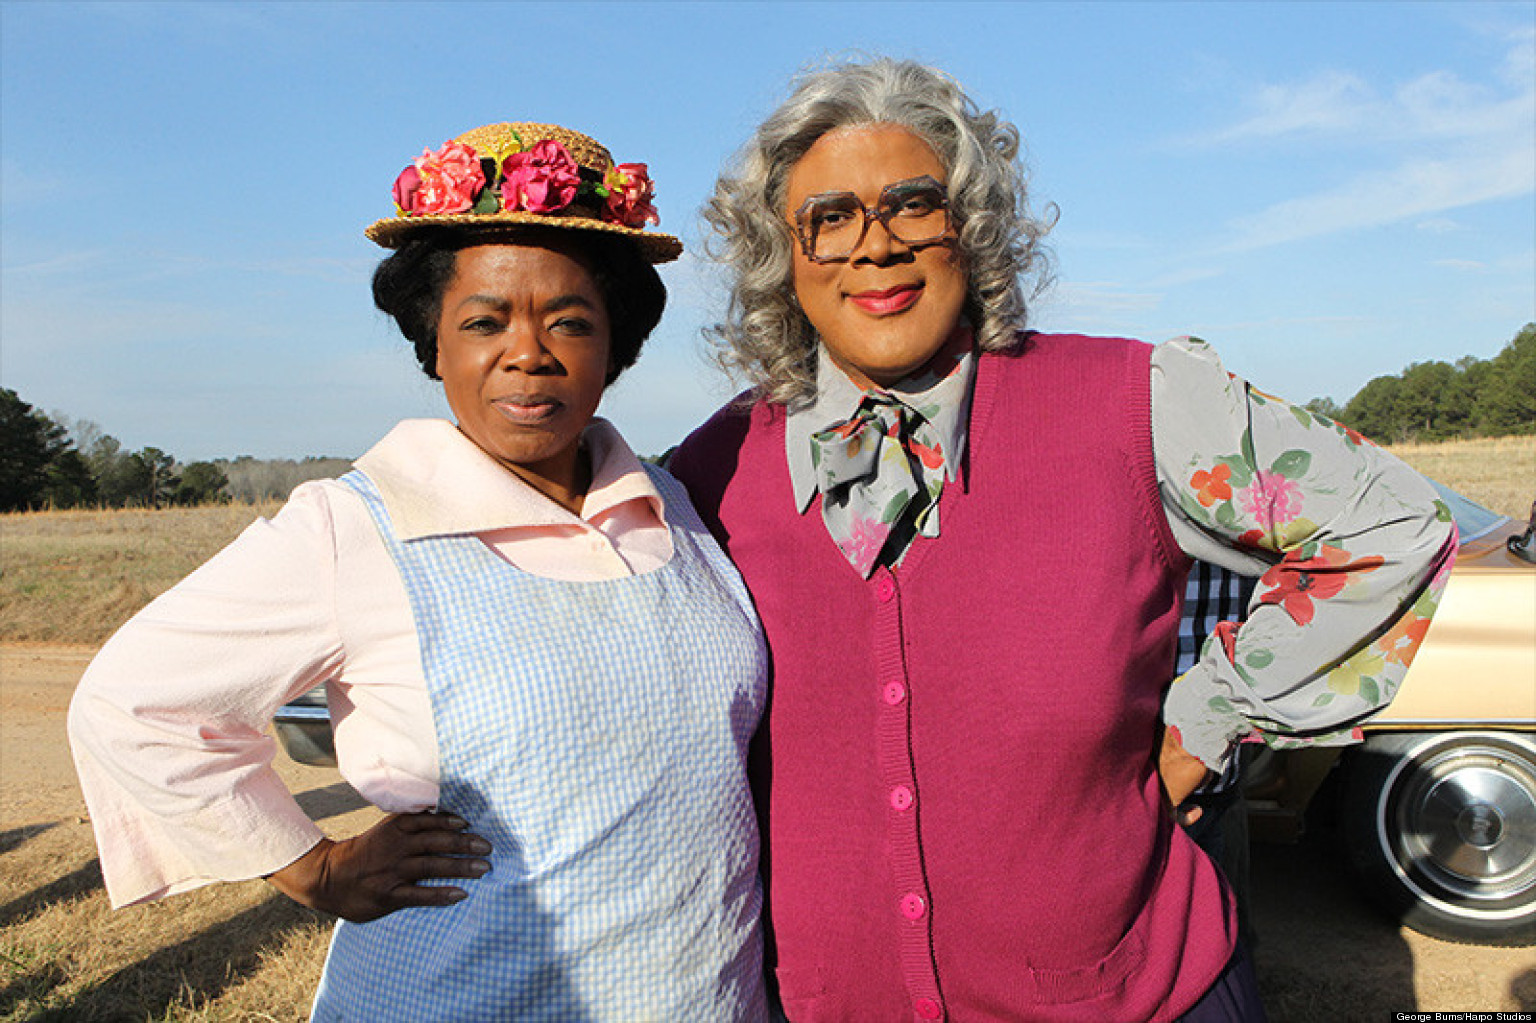 Madea and sofia parody oprah and tyler perry s alter egos team up to